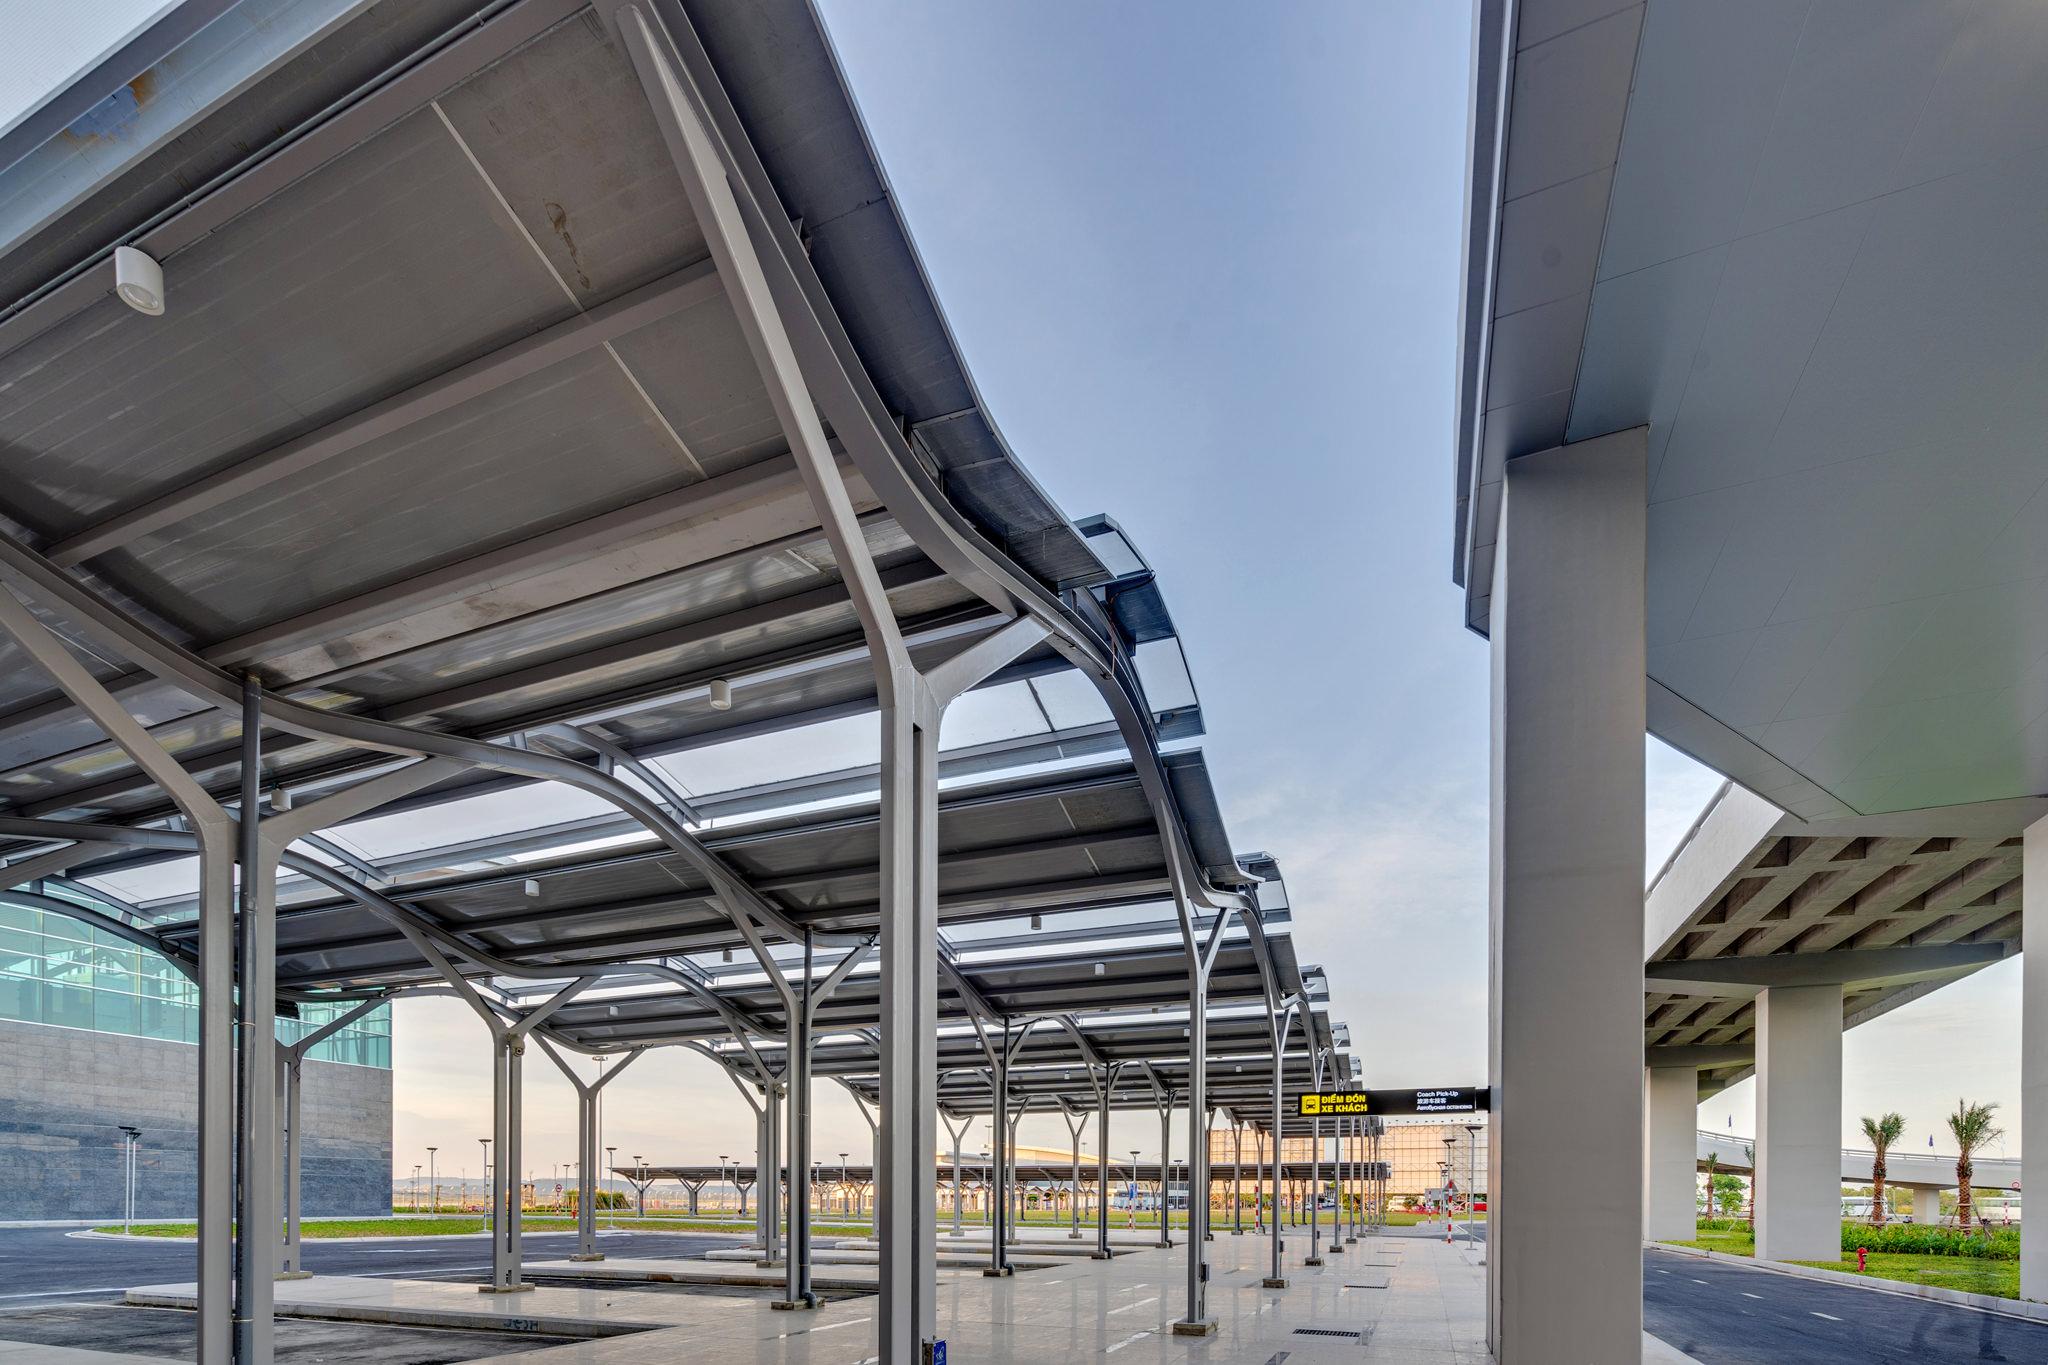 20180626 - Cam Ranh Airport - Architecture - 0036.jpg